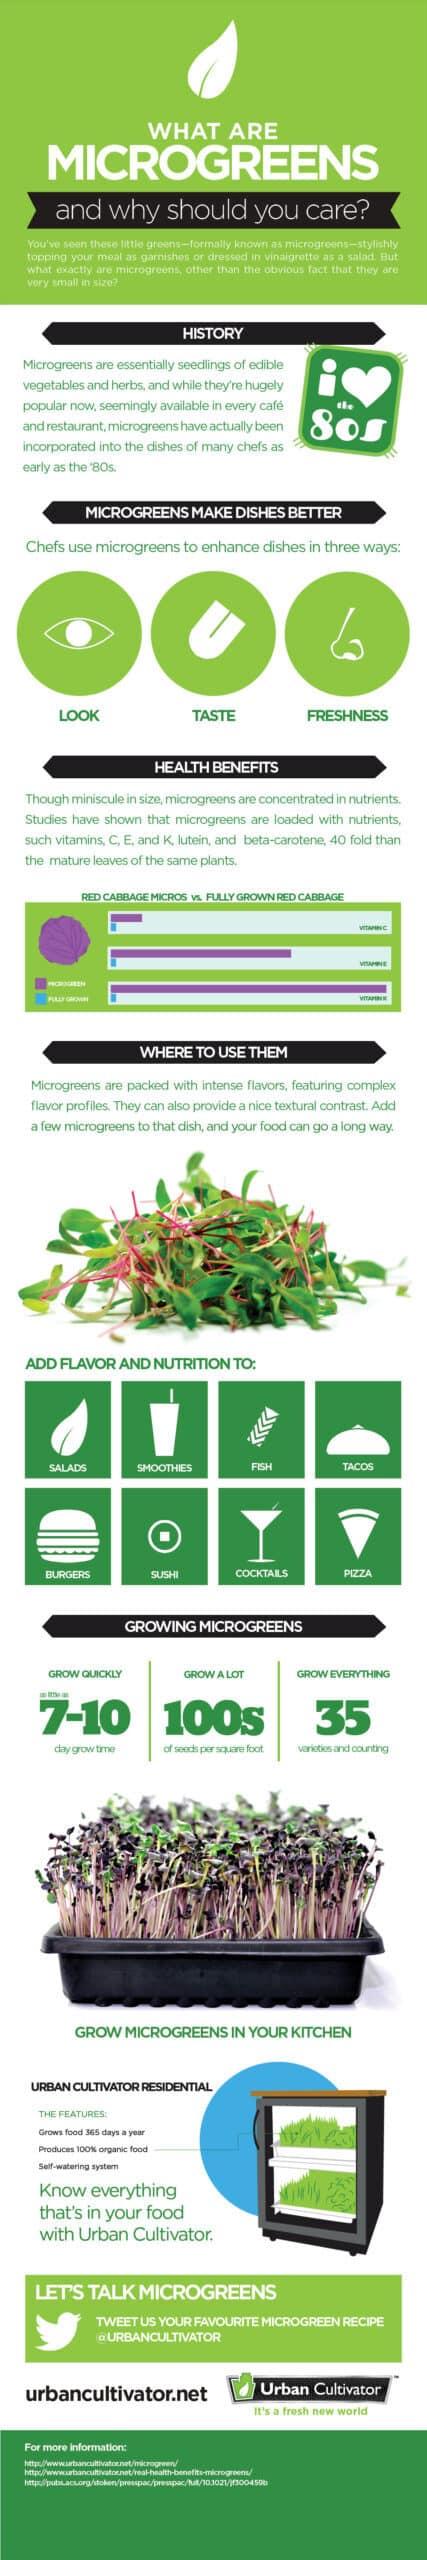 microgreens_infographic-1584422